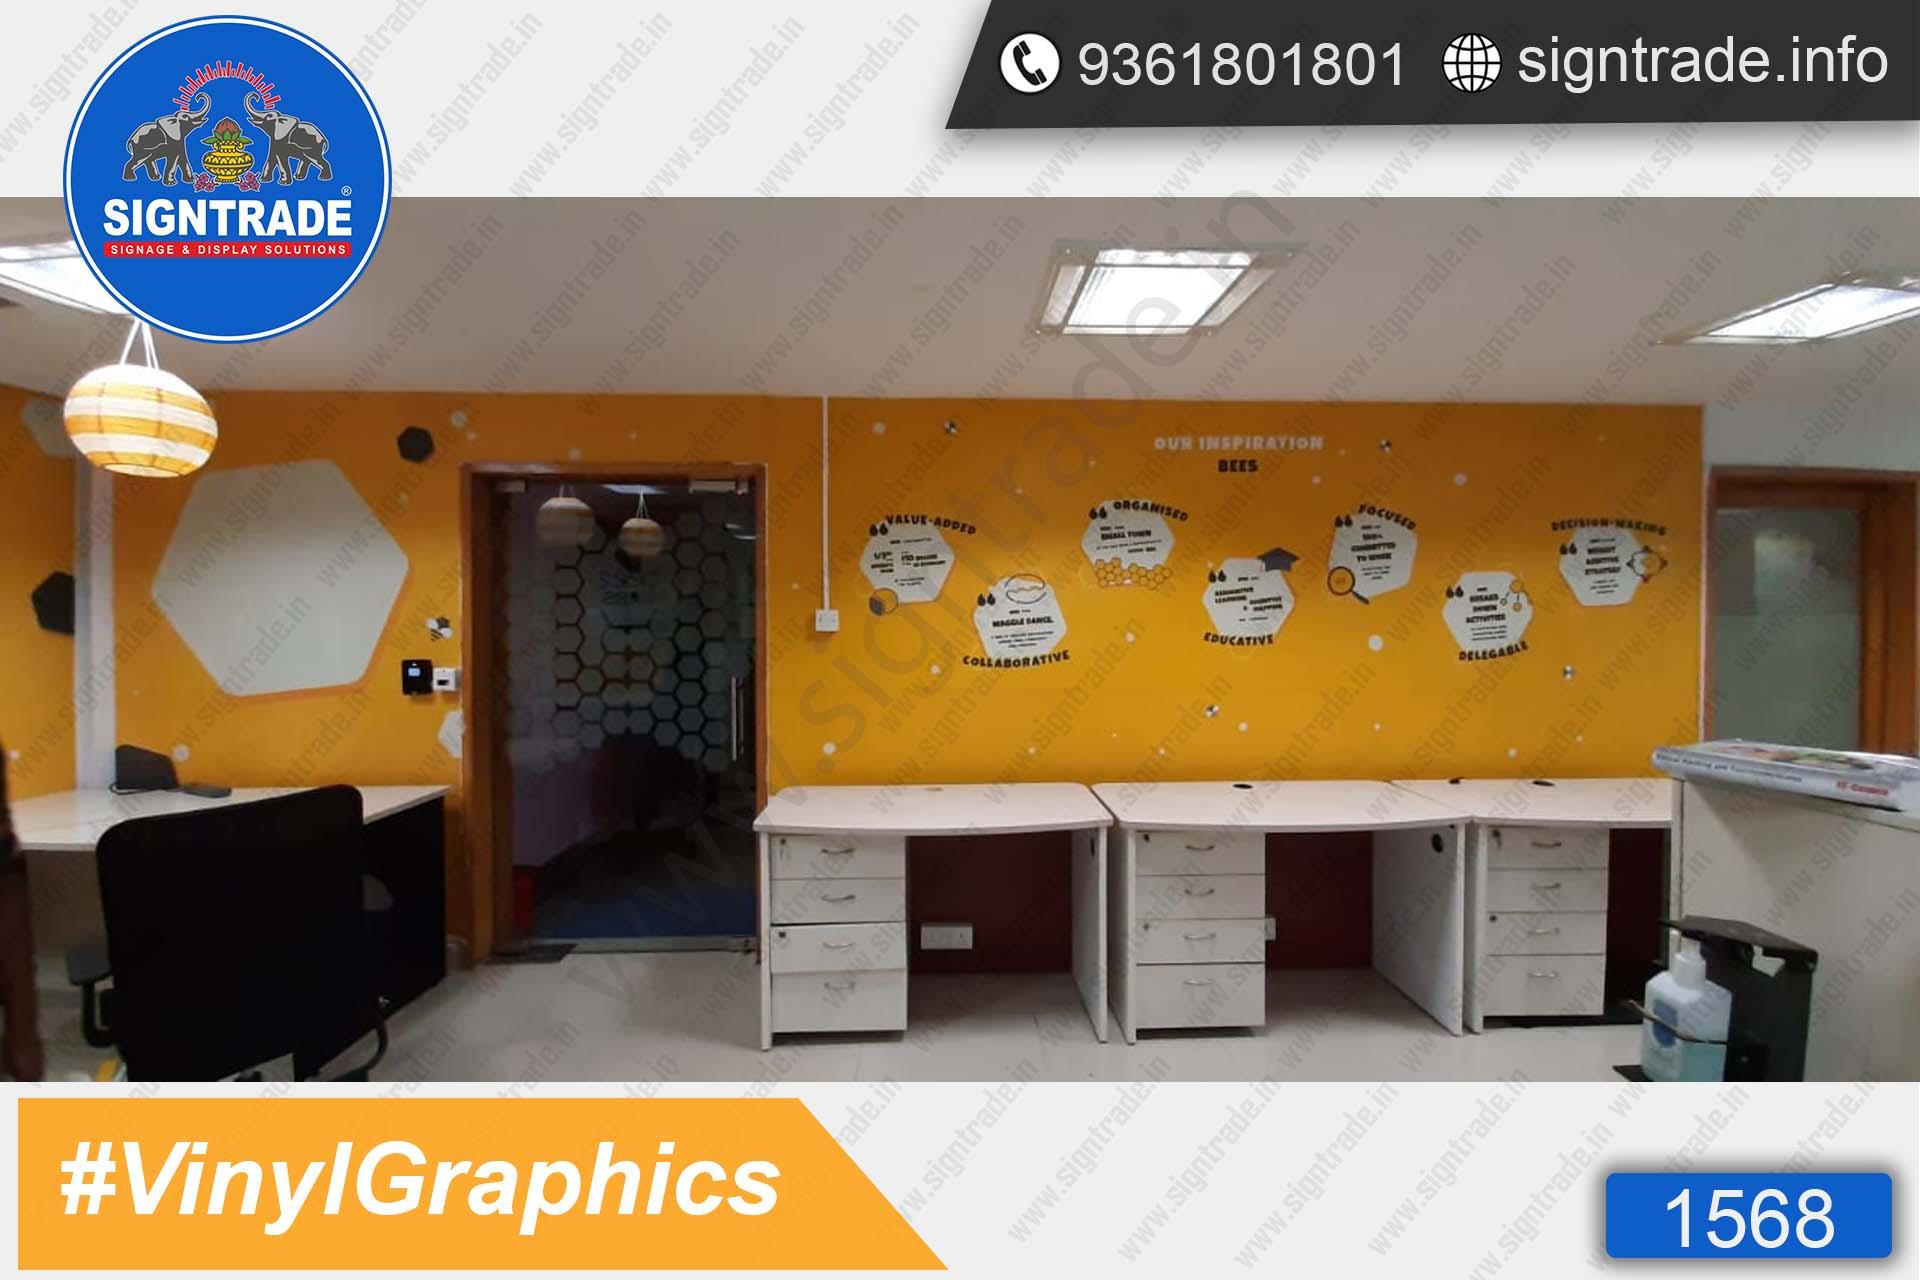 Beez labs, Chennai - SIGNTRADE - Wall Graphics, Vinyl Graphics, Vinyl Printing Service in Chennai